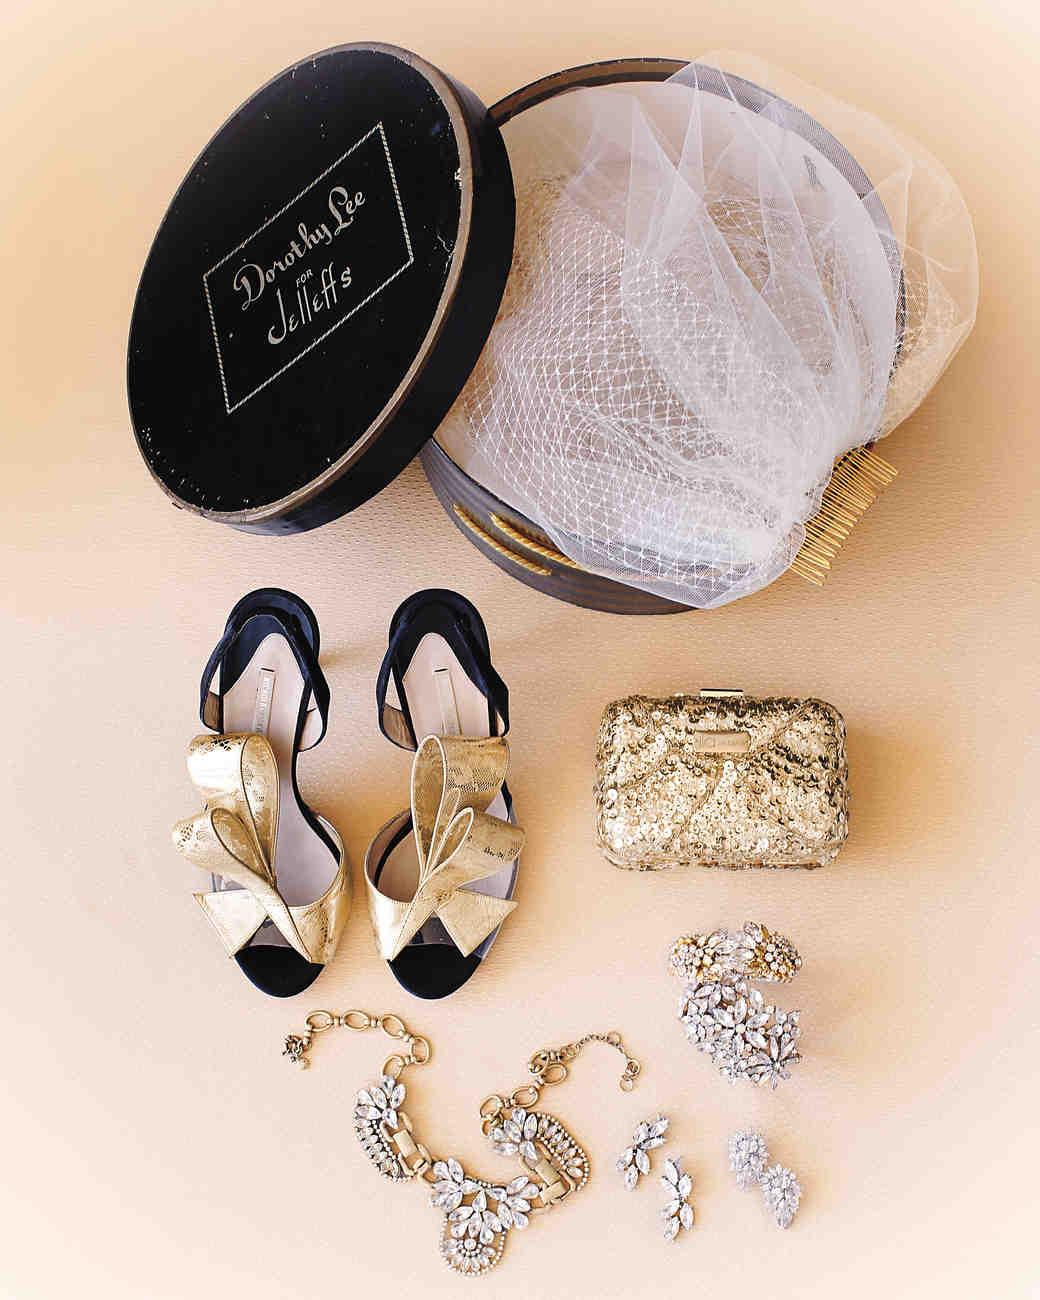 shoes-bag-veil-necklace-006-mwd109359.jpg